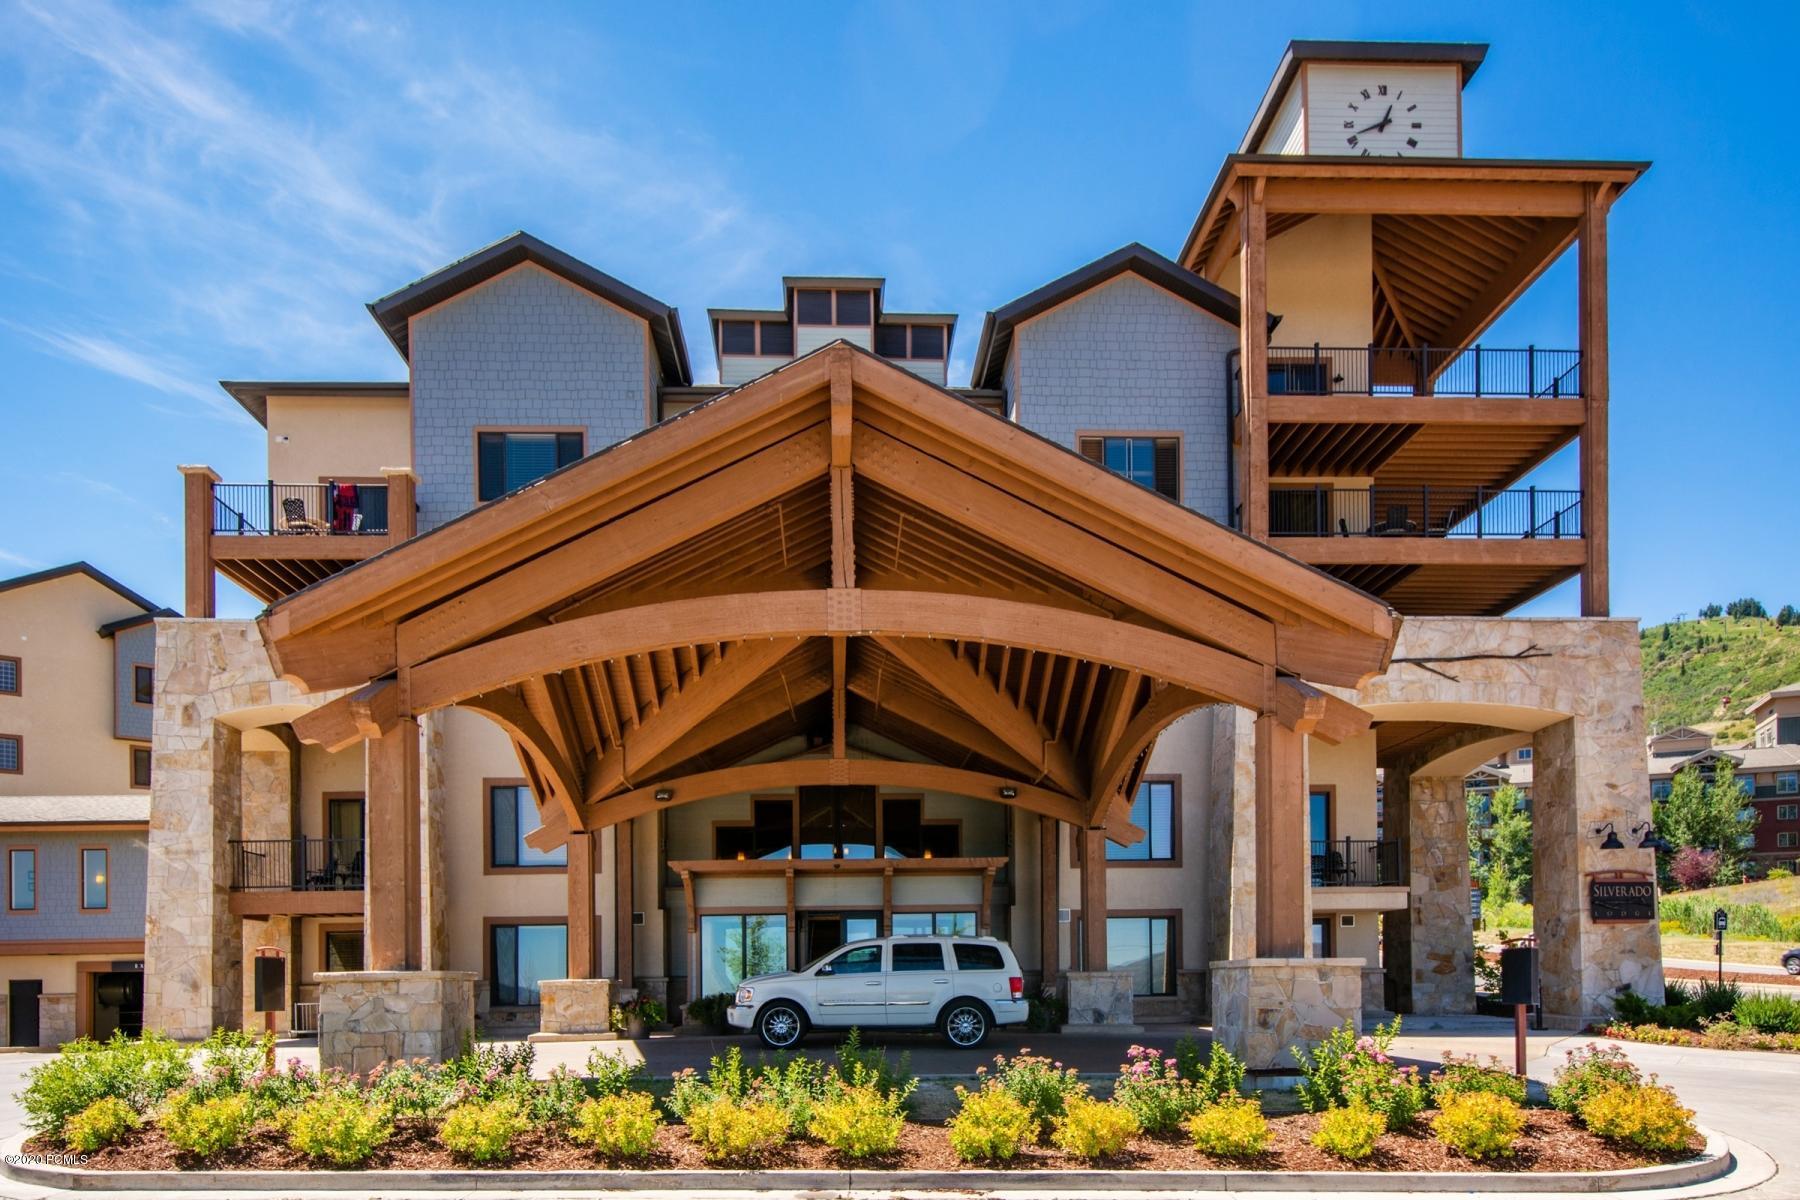 2653 Canyons Resort Drive, Park City, Utah 84098, 2 Bedrooms Bedrooms, ,3 BathroomsBathrooms,Condominium,For Sale,Canyons Resort,12003749